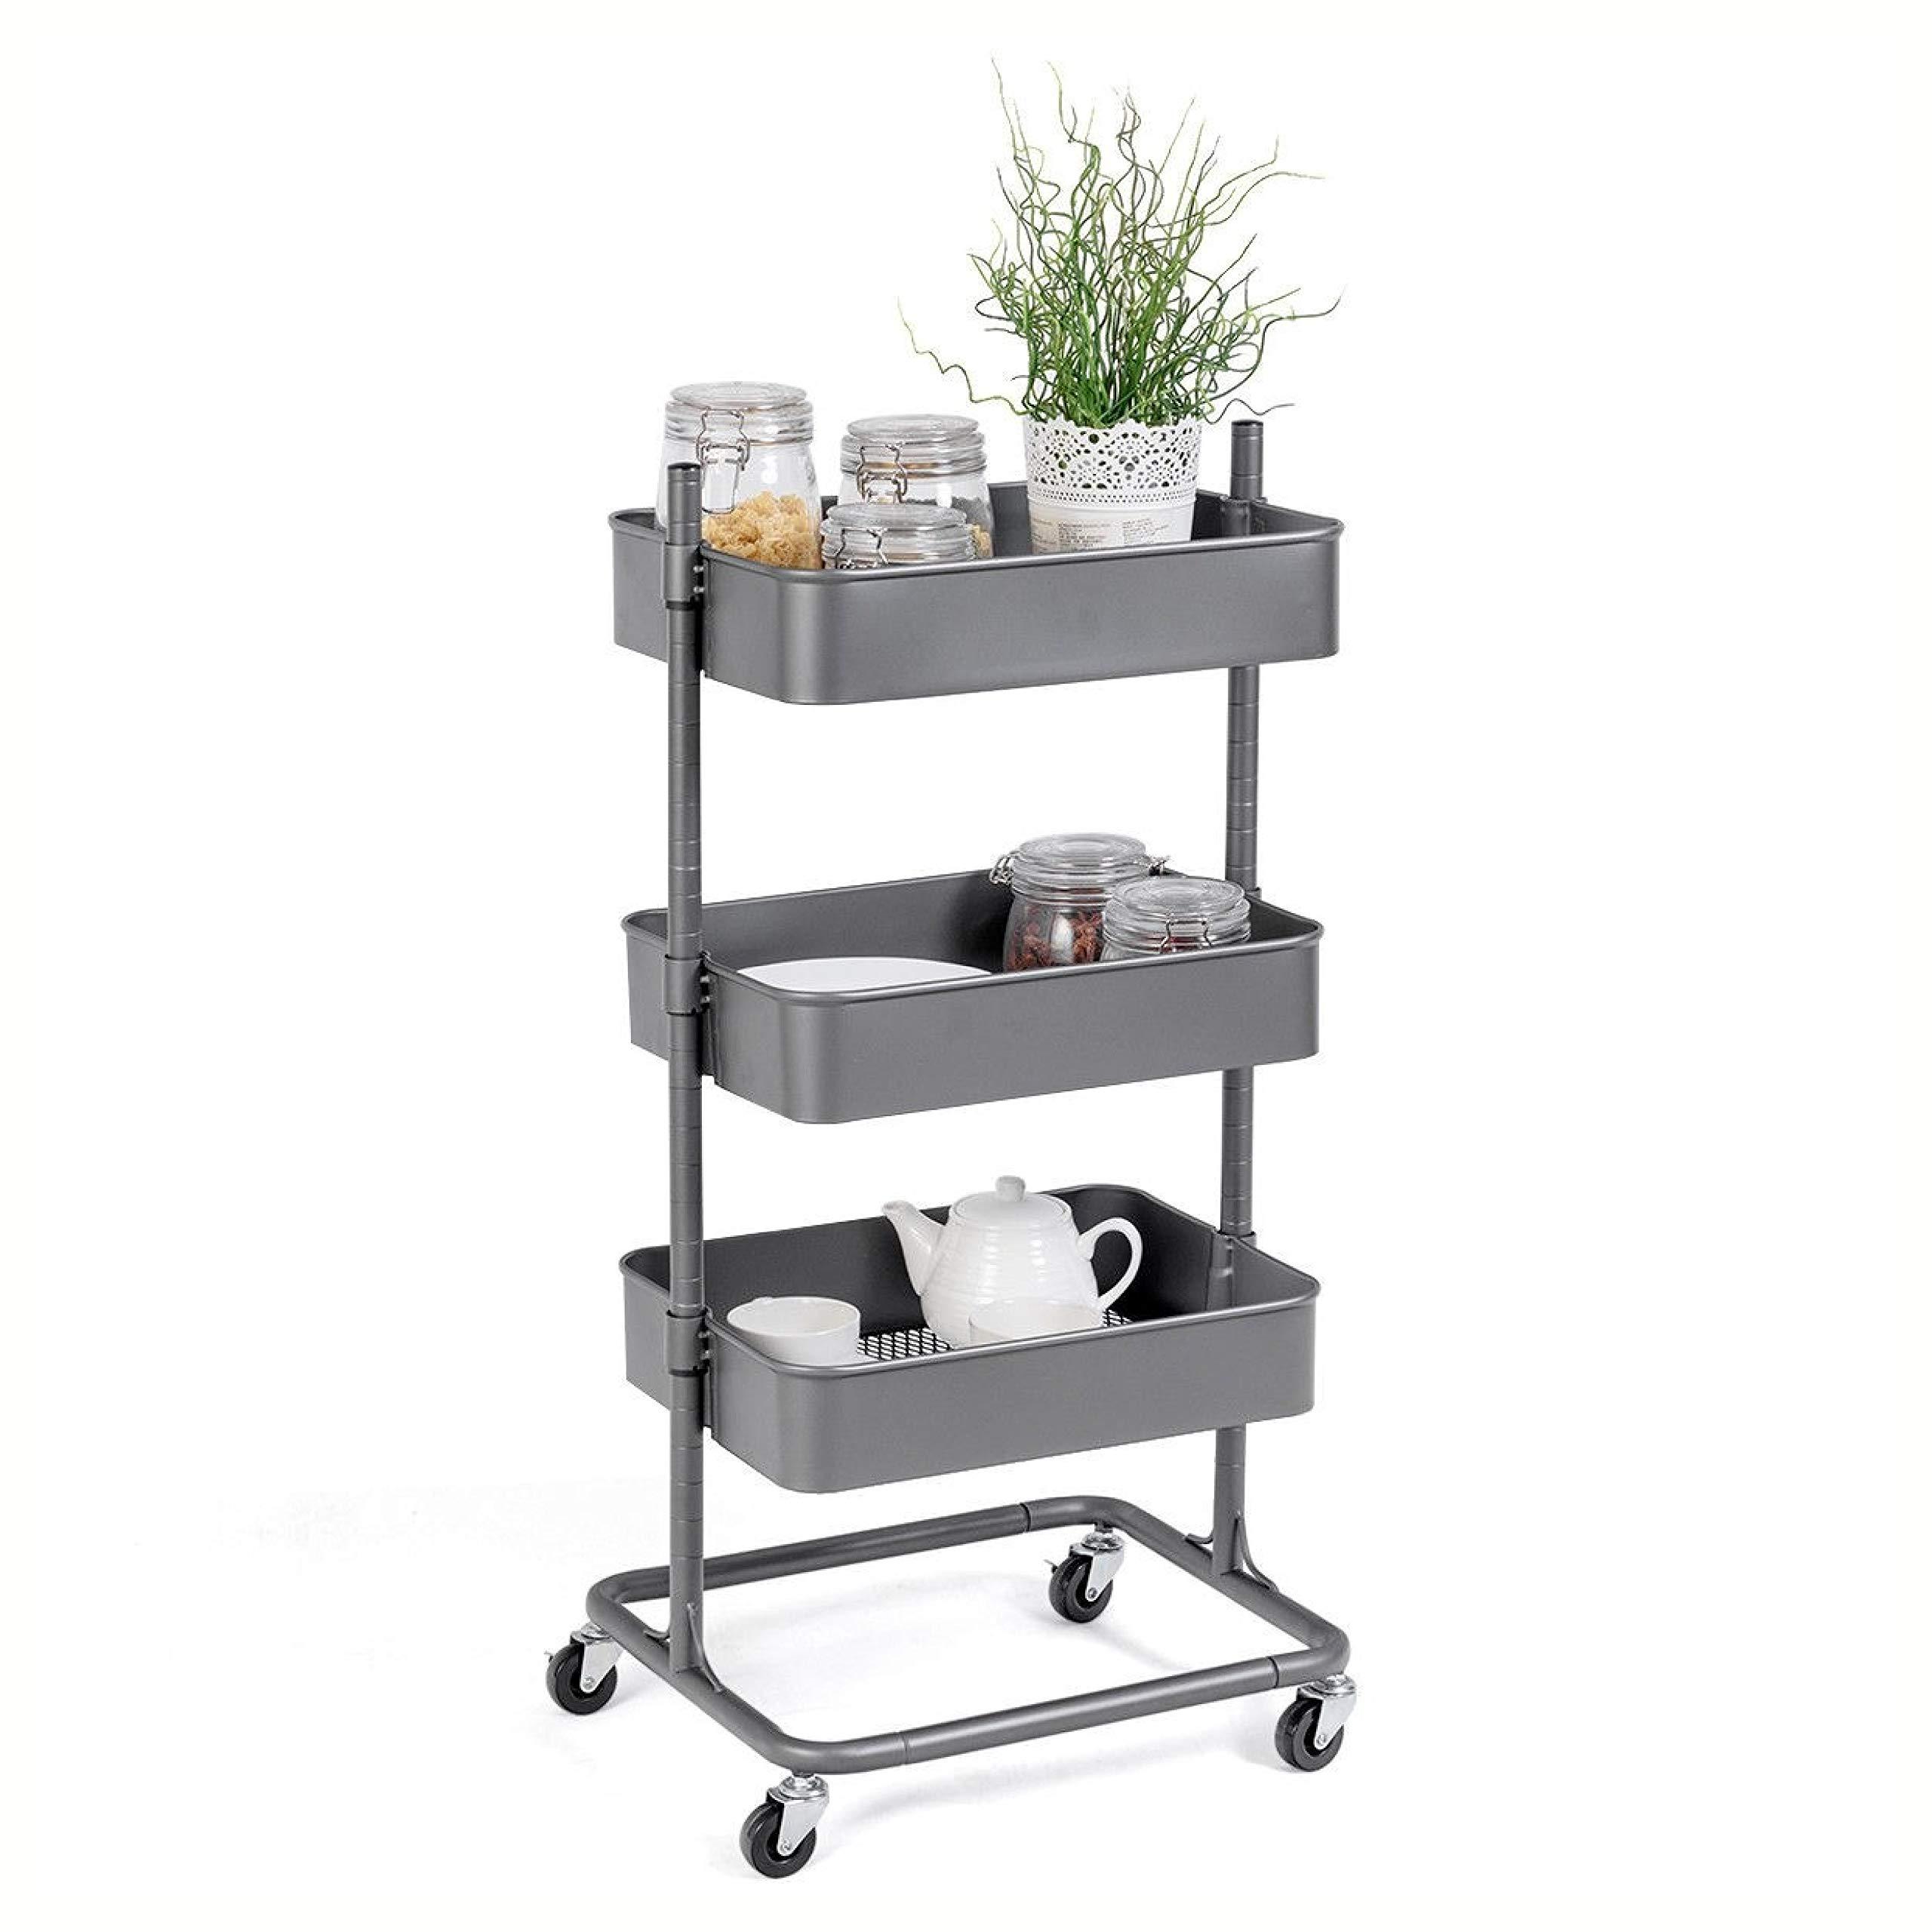 Kitchen & Dining Cart, 3 Tier Metal Rolling Utility Storage Cart